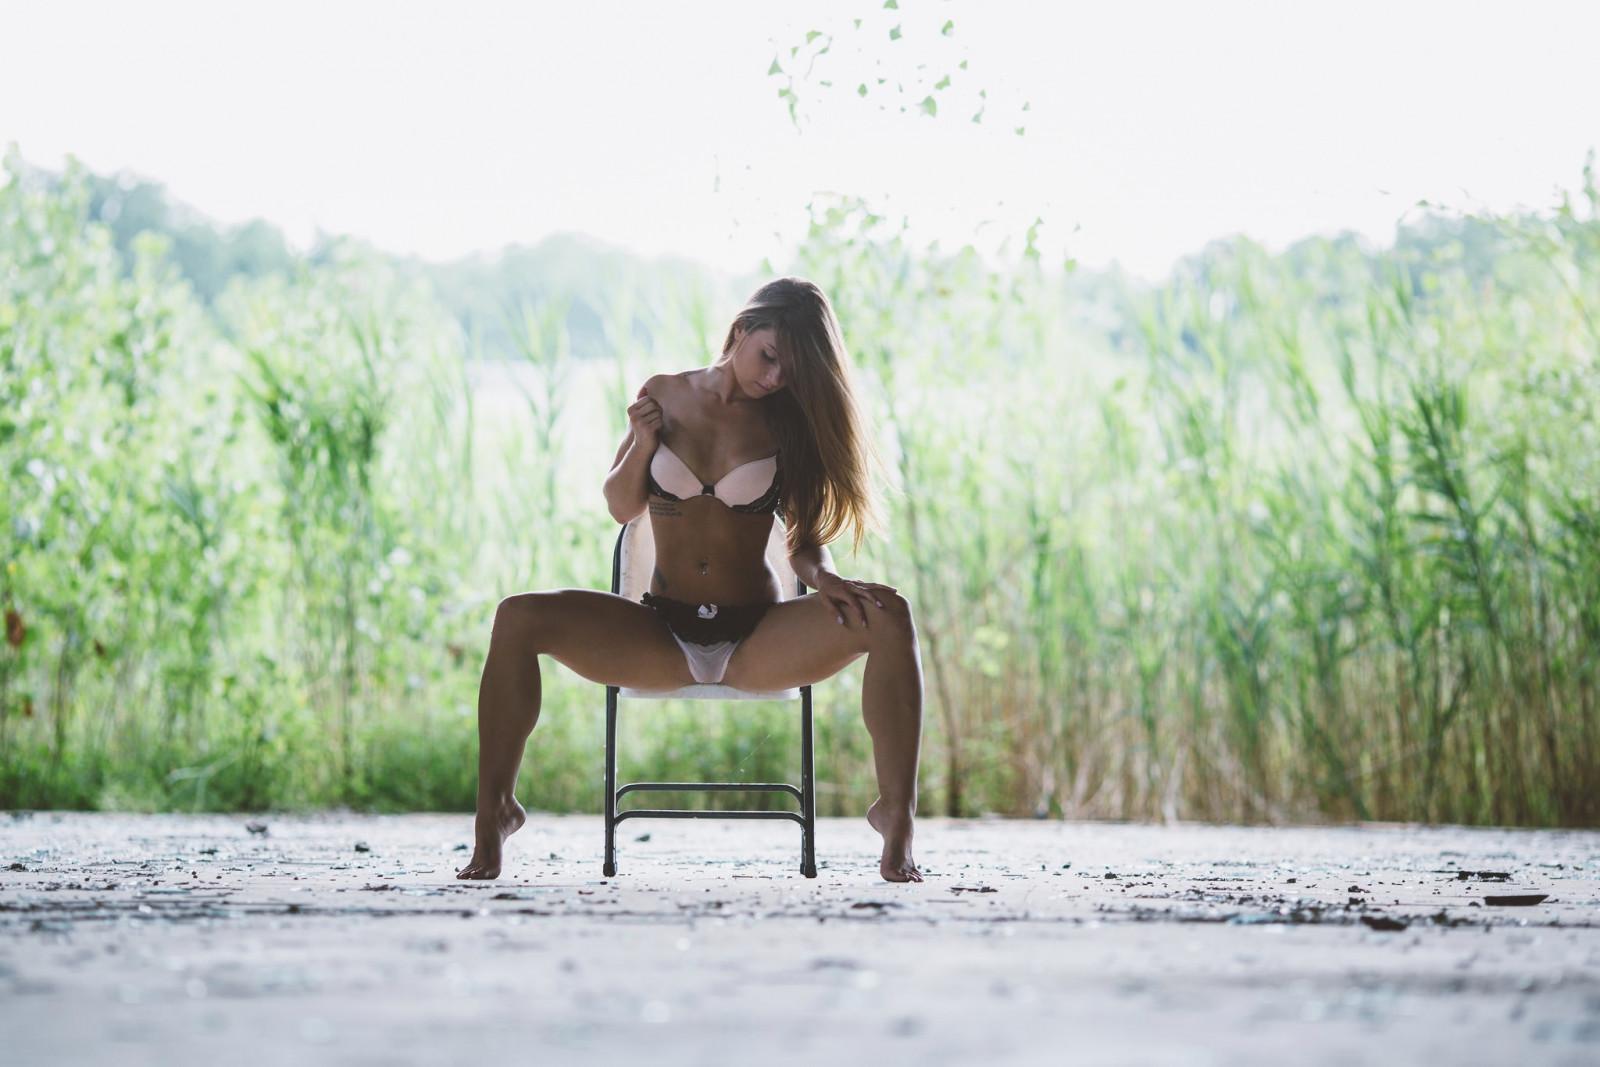 для девушка на стуле раздвинула ноги фото хотела